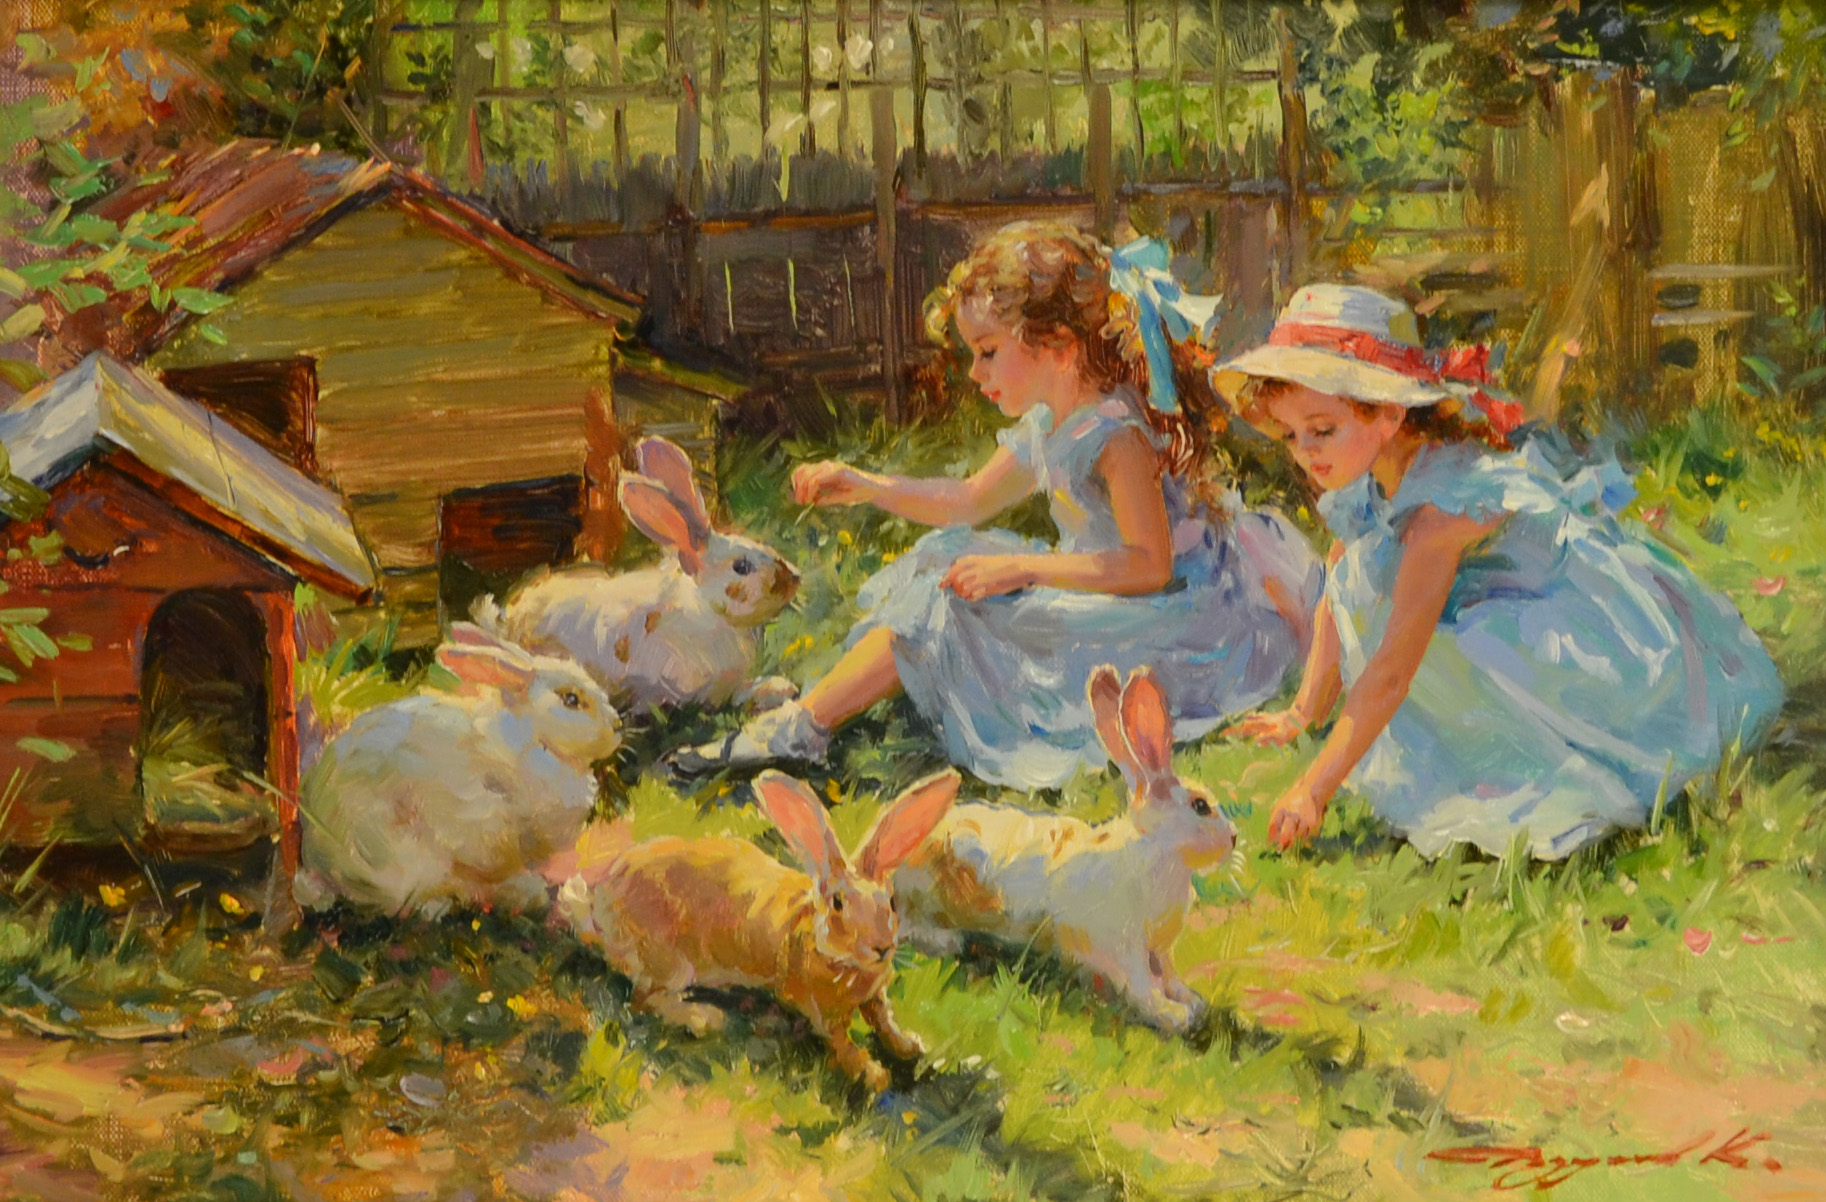 Artist young girl feeding rabbits, katrina kaif xxx bekni